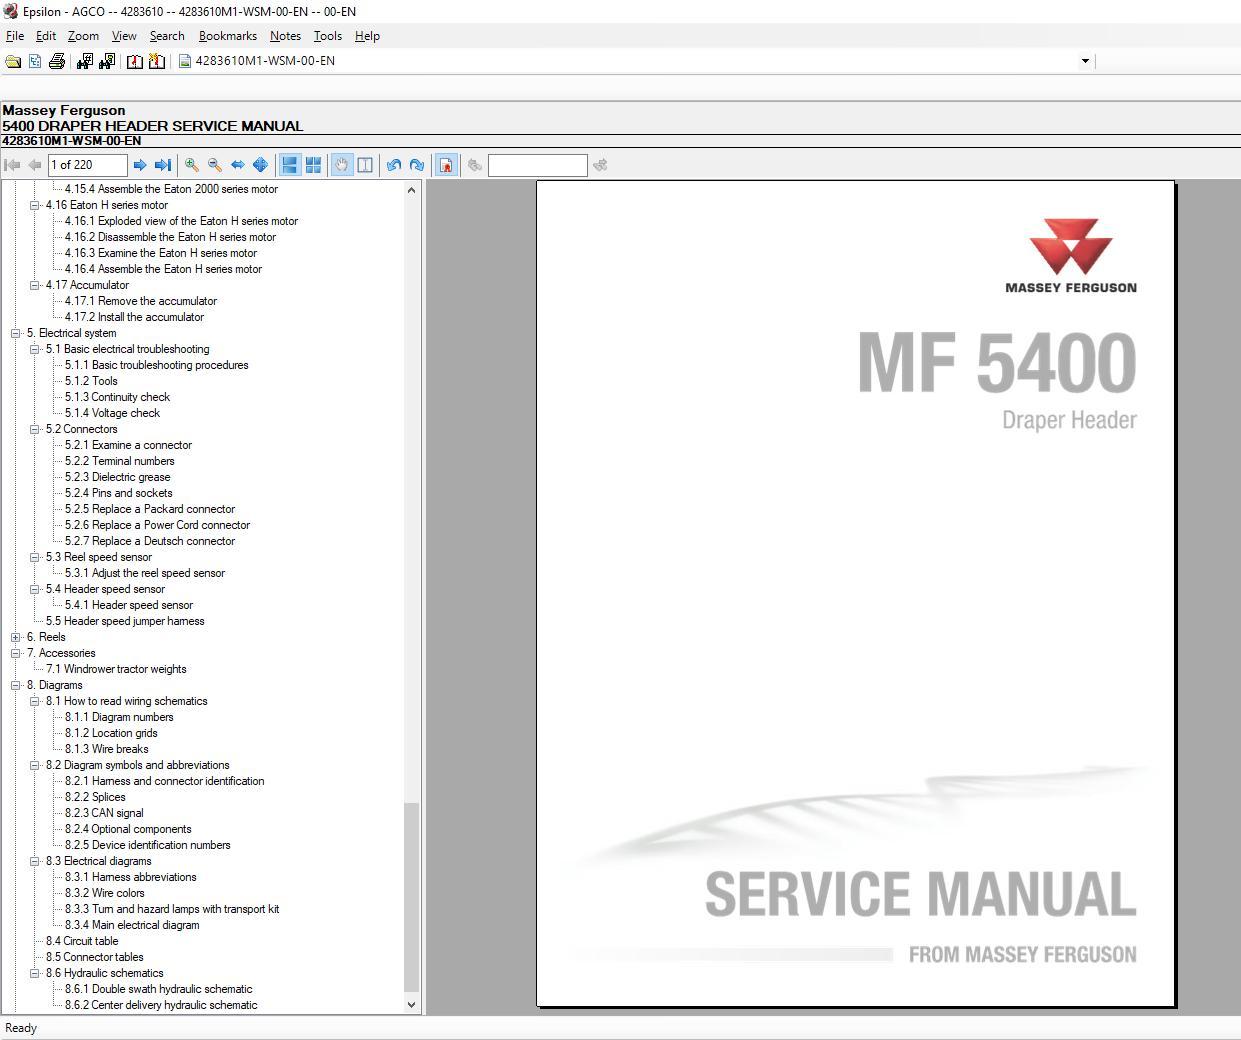 Massey_Ferguson_AG_Europe_Parts_Catalog_Workshop_Service_Manuals_2020_7